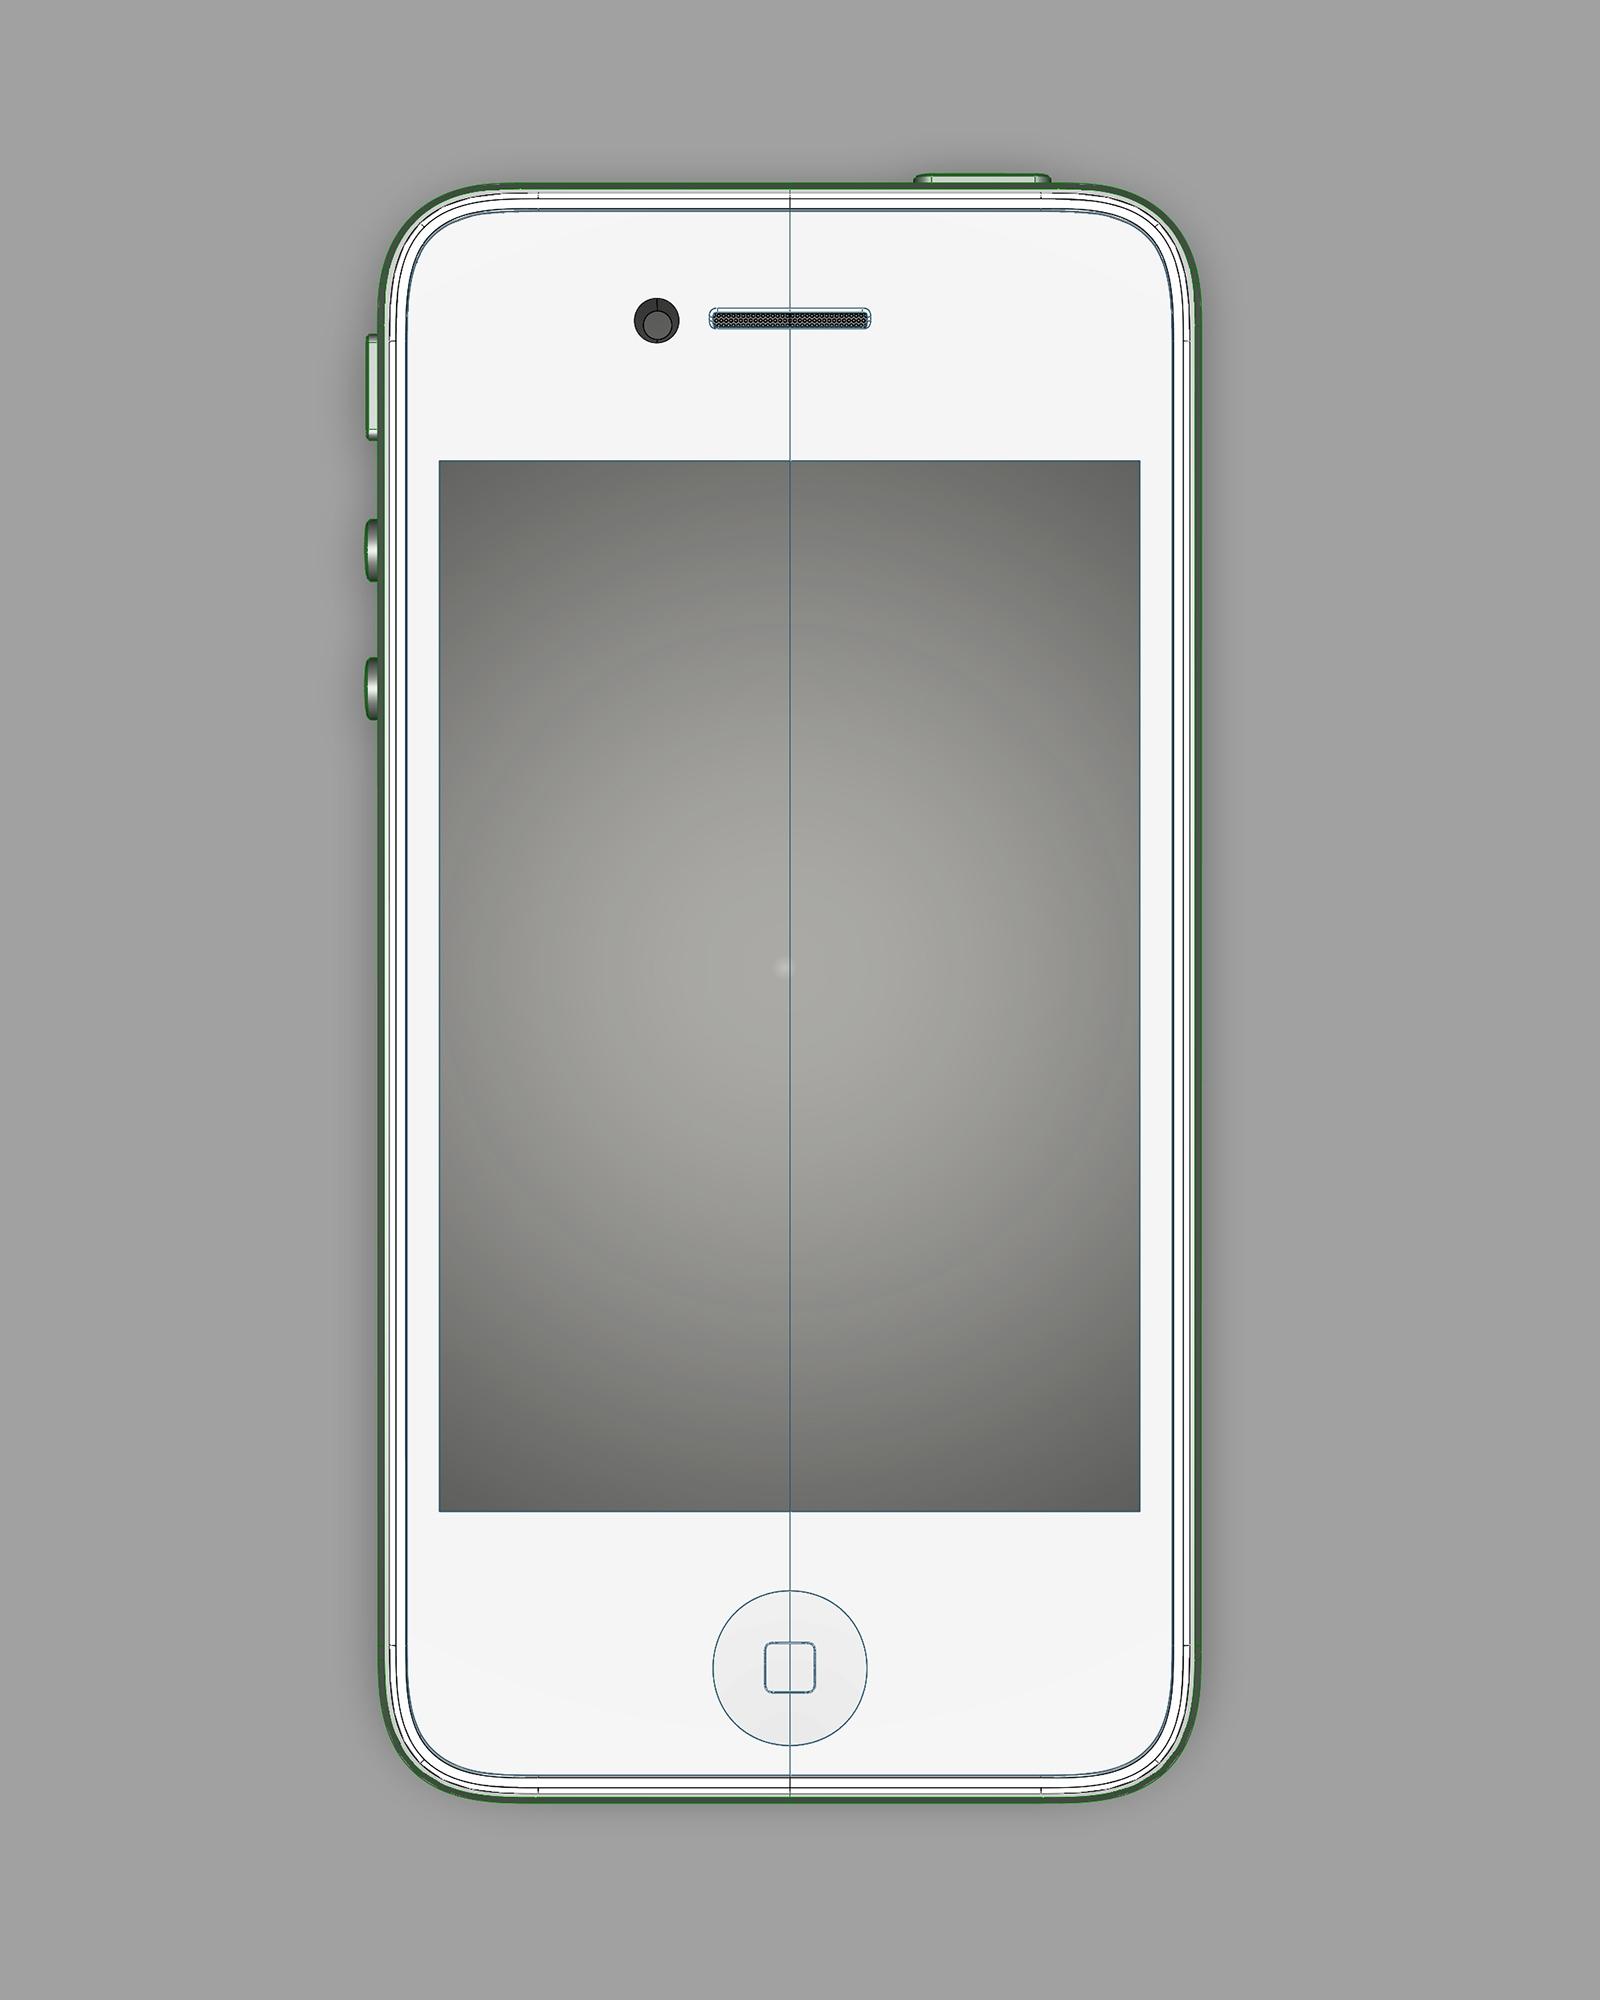 iphone-3-1-2000.jpg